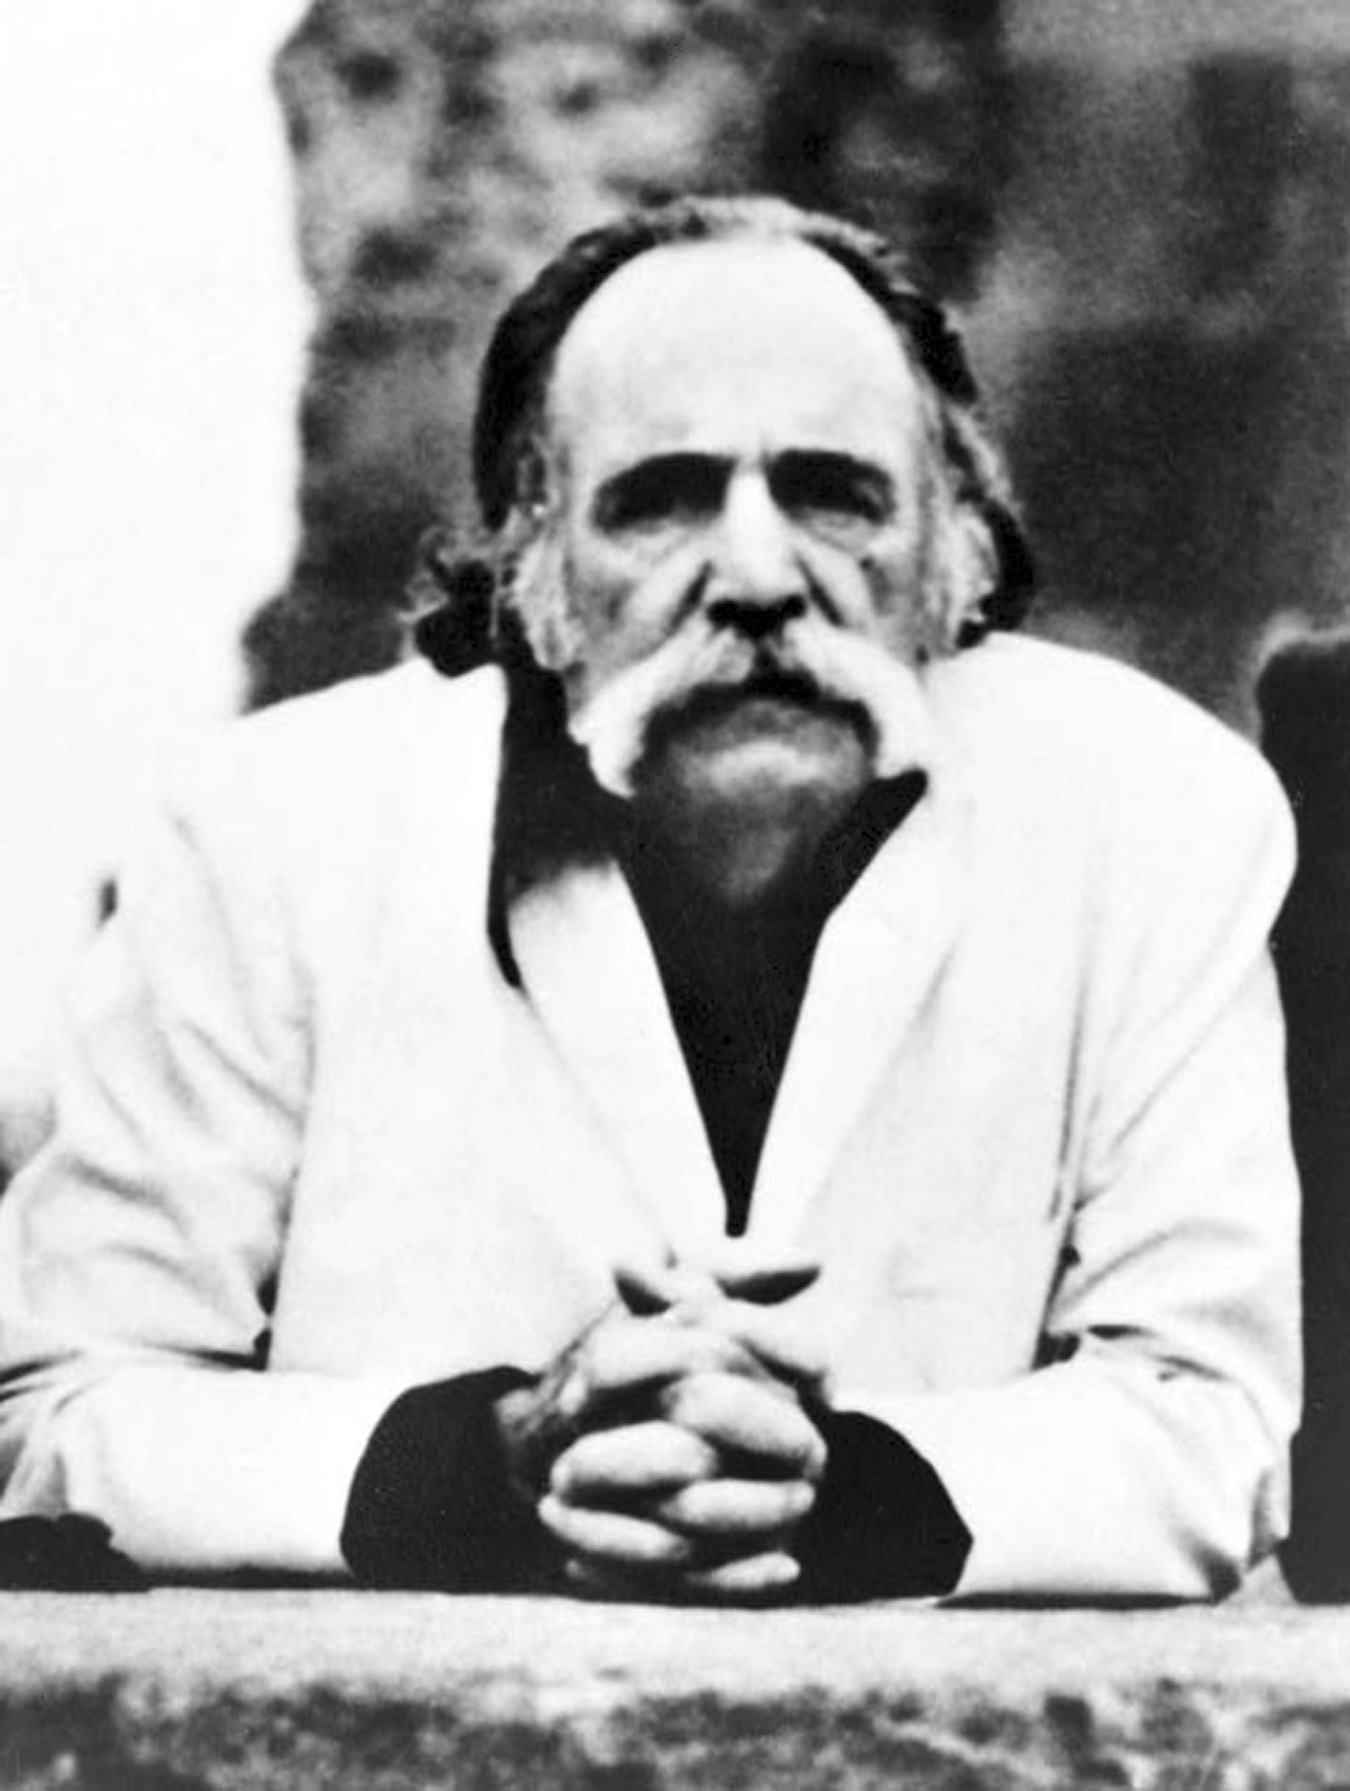 Portrait of William Saroyan